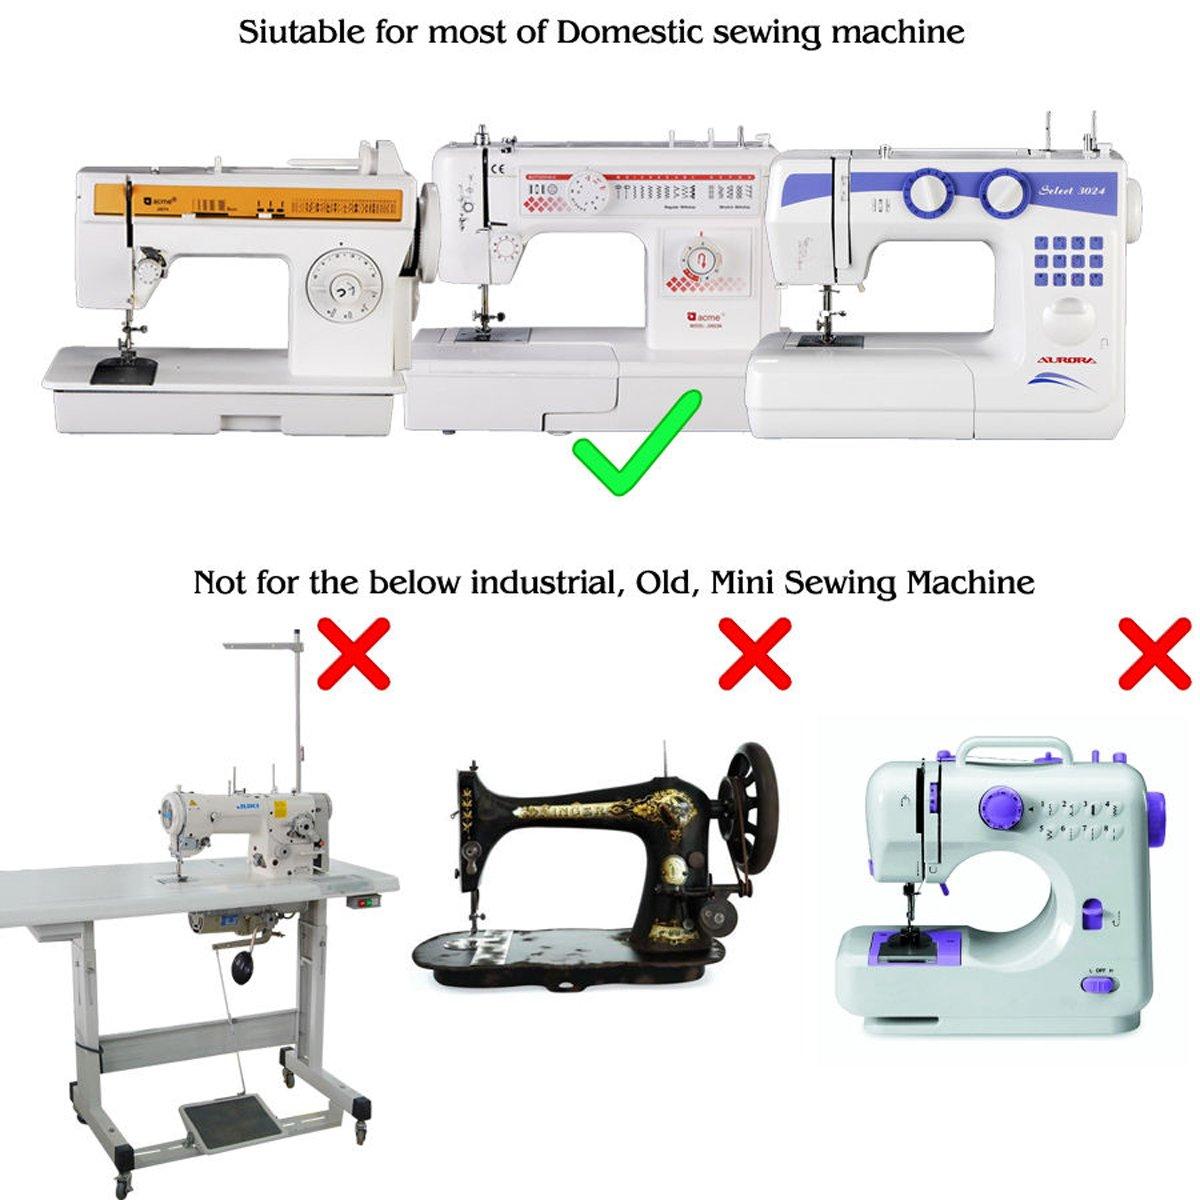 JOYOOO 32pcs doméstica Máquina de coser Presser Foot Kit para BROTHER, BUTTERFLY, SINGER, ACME, JANOME, FY, YOKOYAMA, JUKI, IKEA, etc: Amazon.es: Hogar